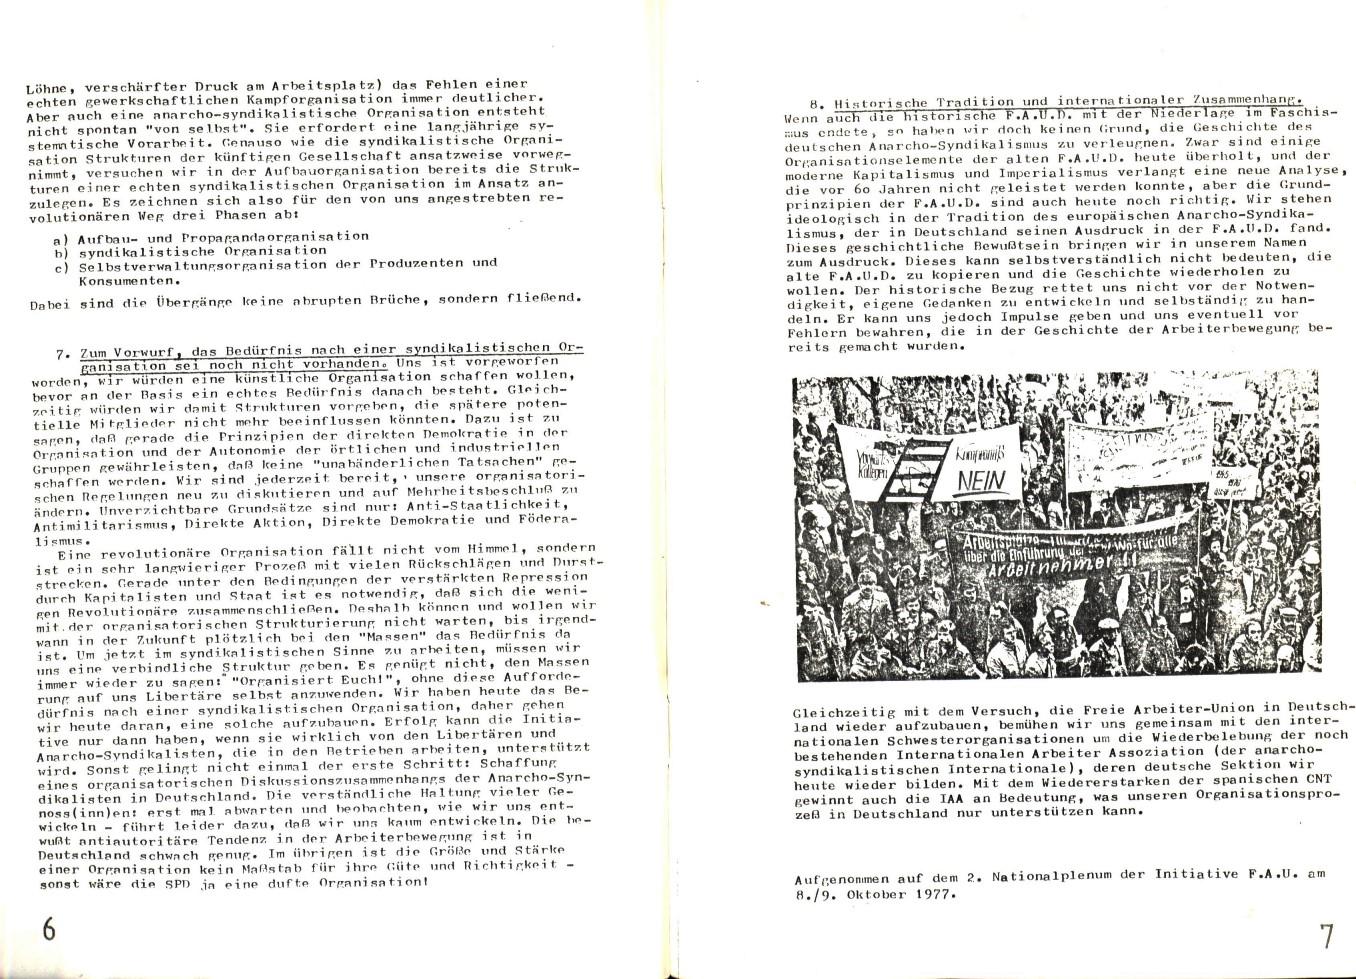 FAU_1979_Arbeitsgrundlage_04